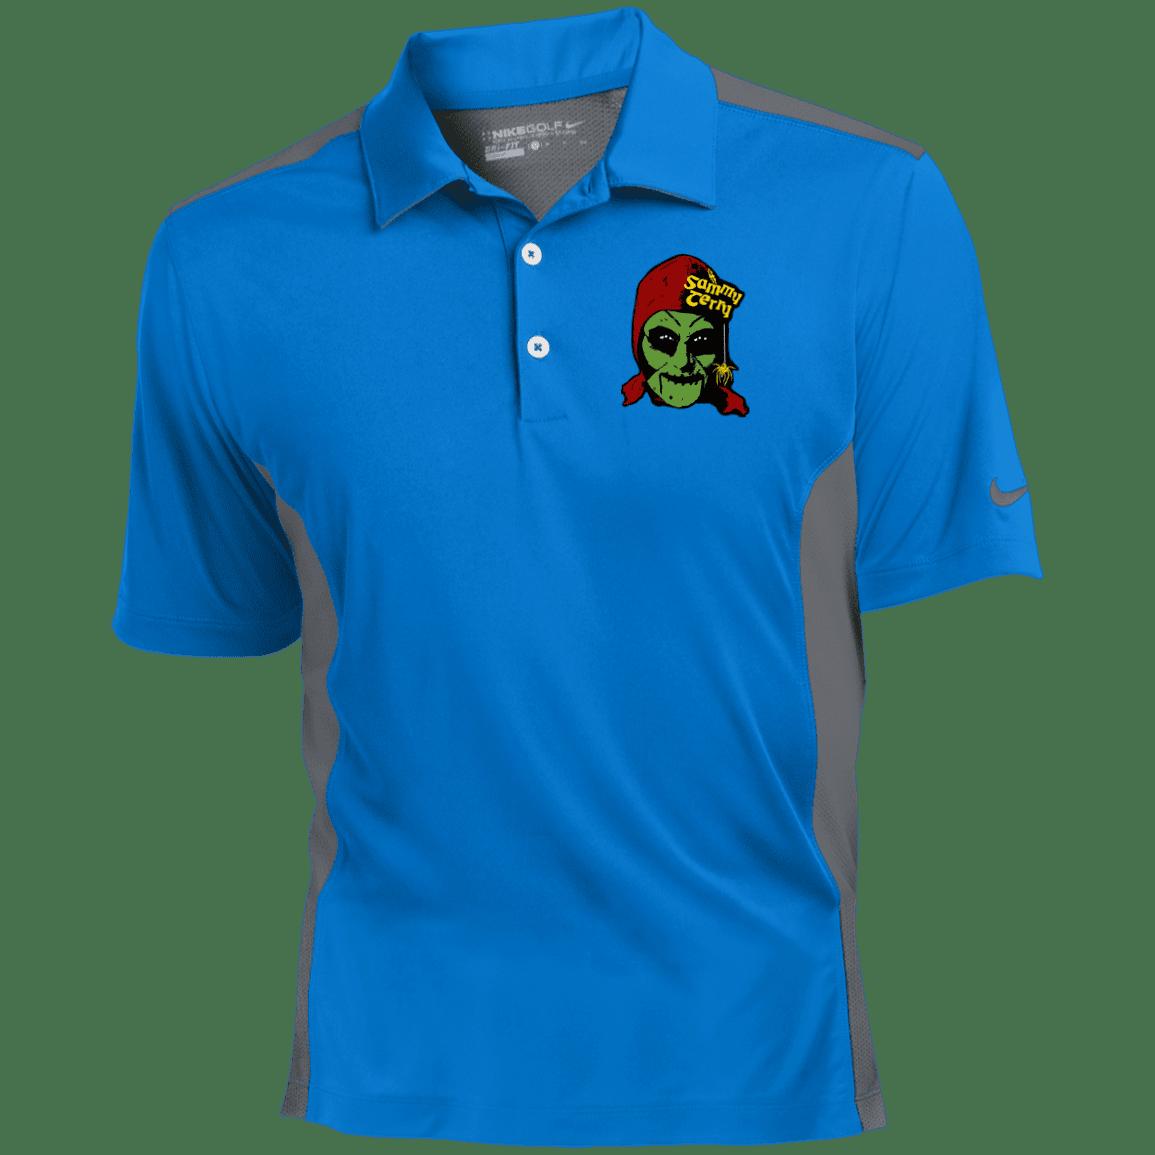 Sammy Head Color Nike Golf Dri Fit Polo Asstd Colors Sammy Terry